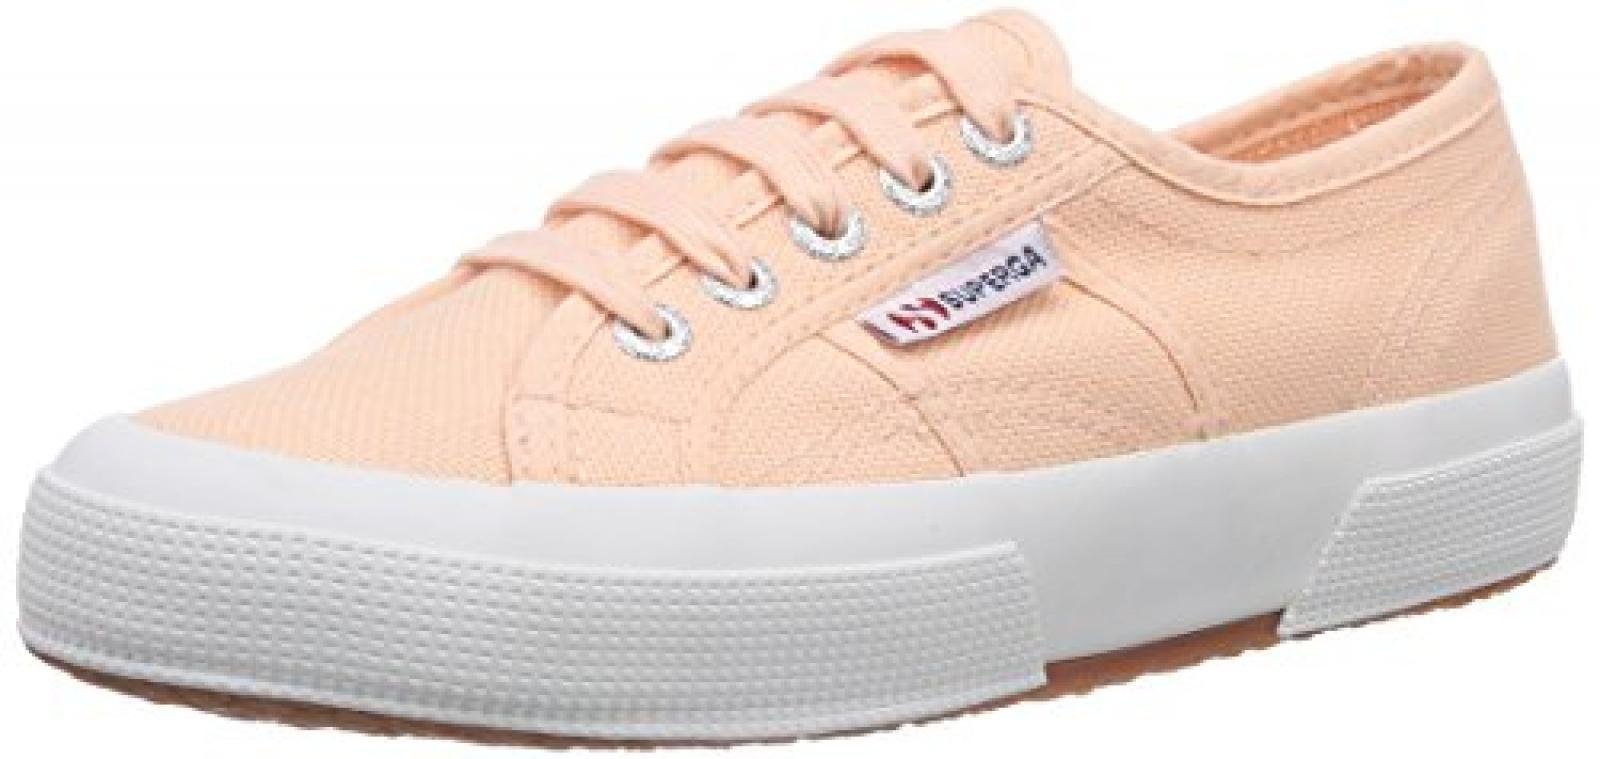 Superga 2750- COTU CLASSIC S000010 Unisex-Erwachsene Sneaker